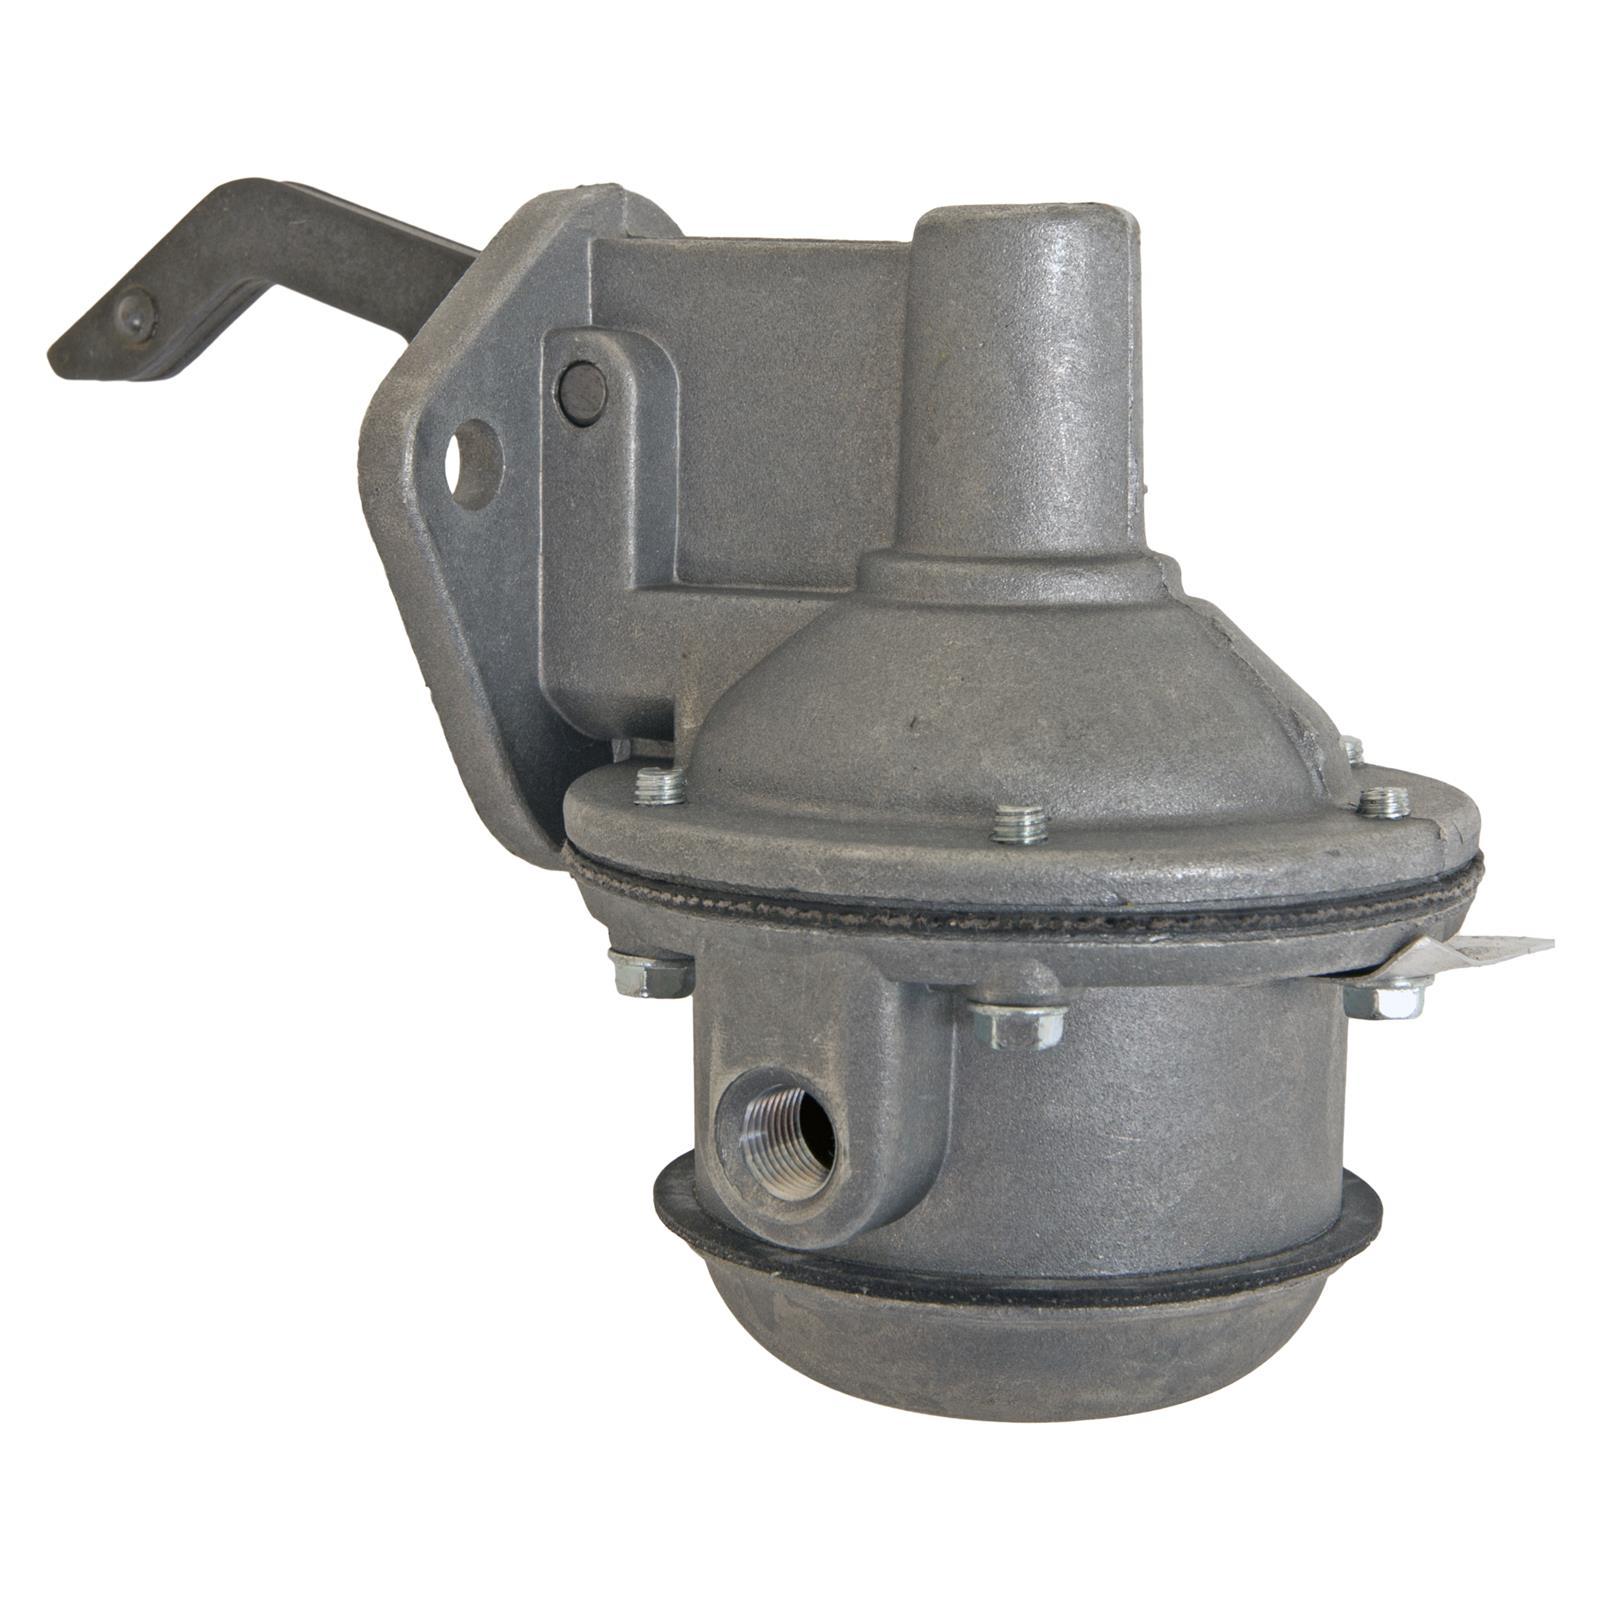 New Fuel Pump Assembly 1998-2000 Alero Cavalier Grand Am Malibu Sunfire GAM115